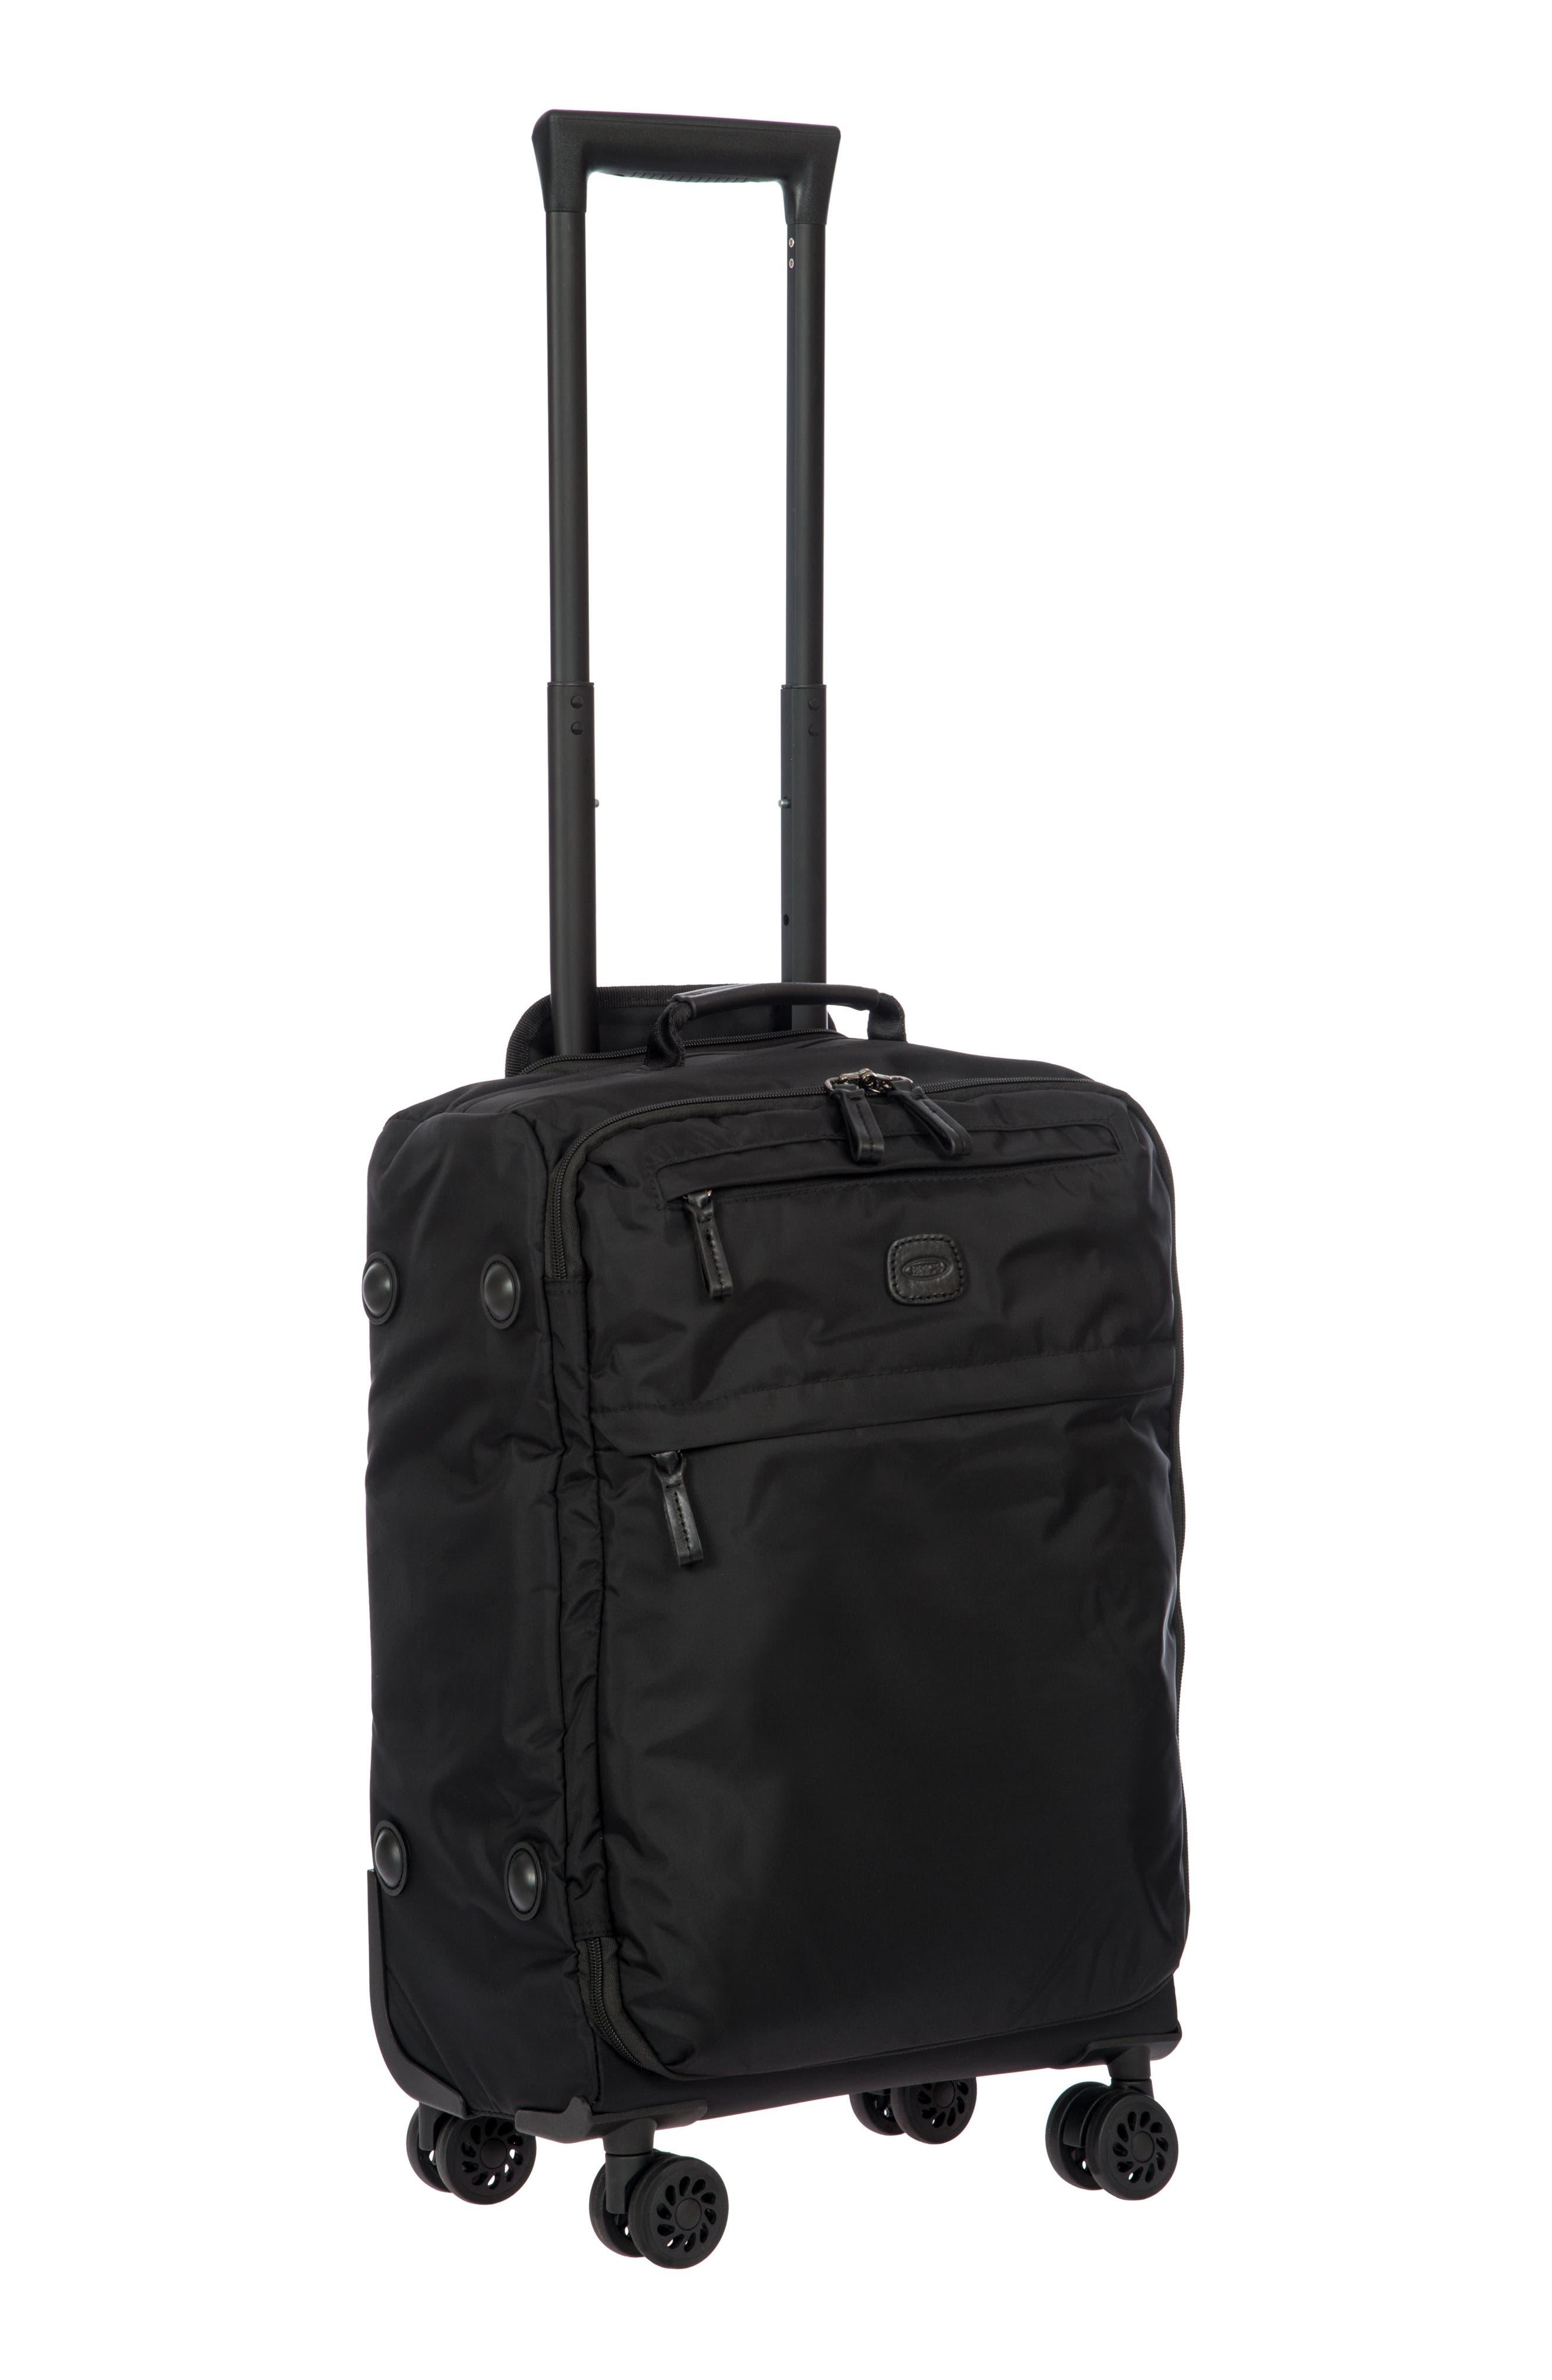 X-Bag 21-Inch Spinner Carry-On,                             Alternate thumbnail 7, color,                             Black/ Black